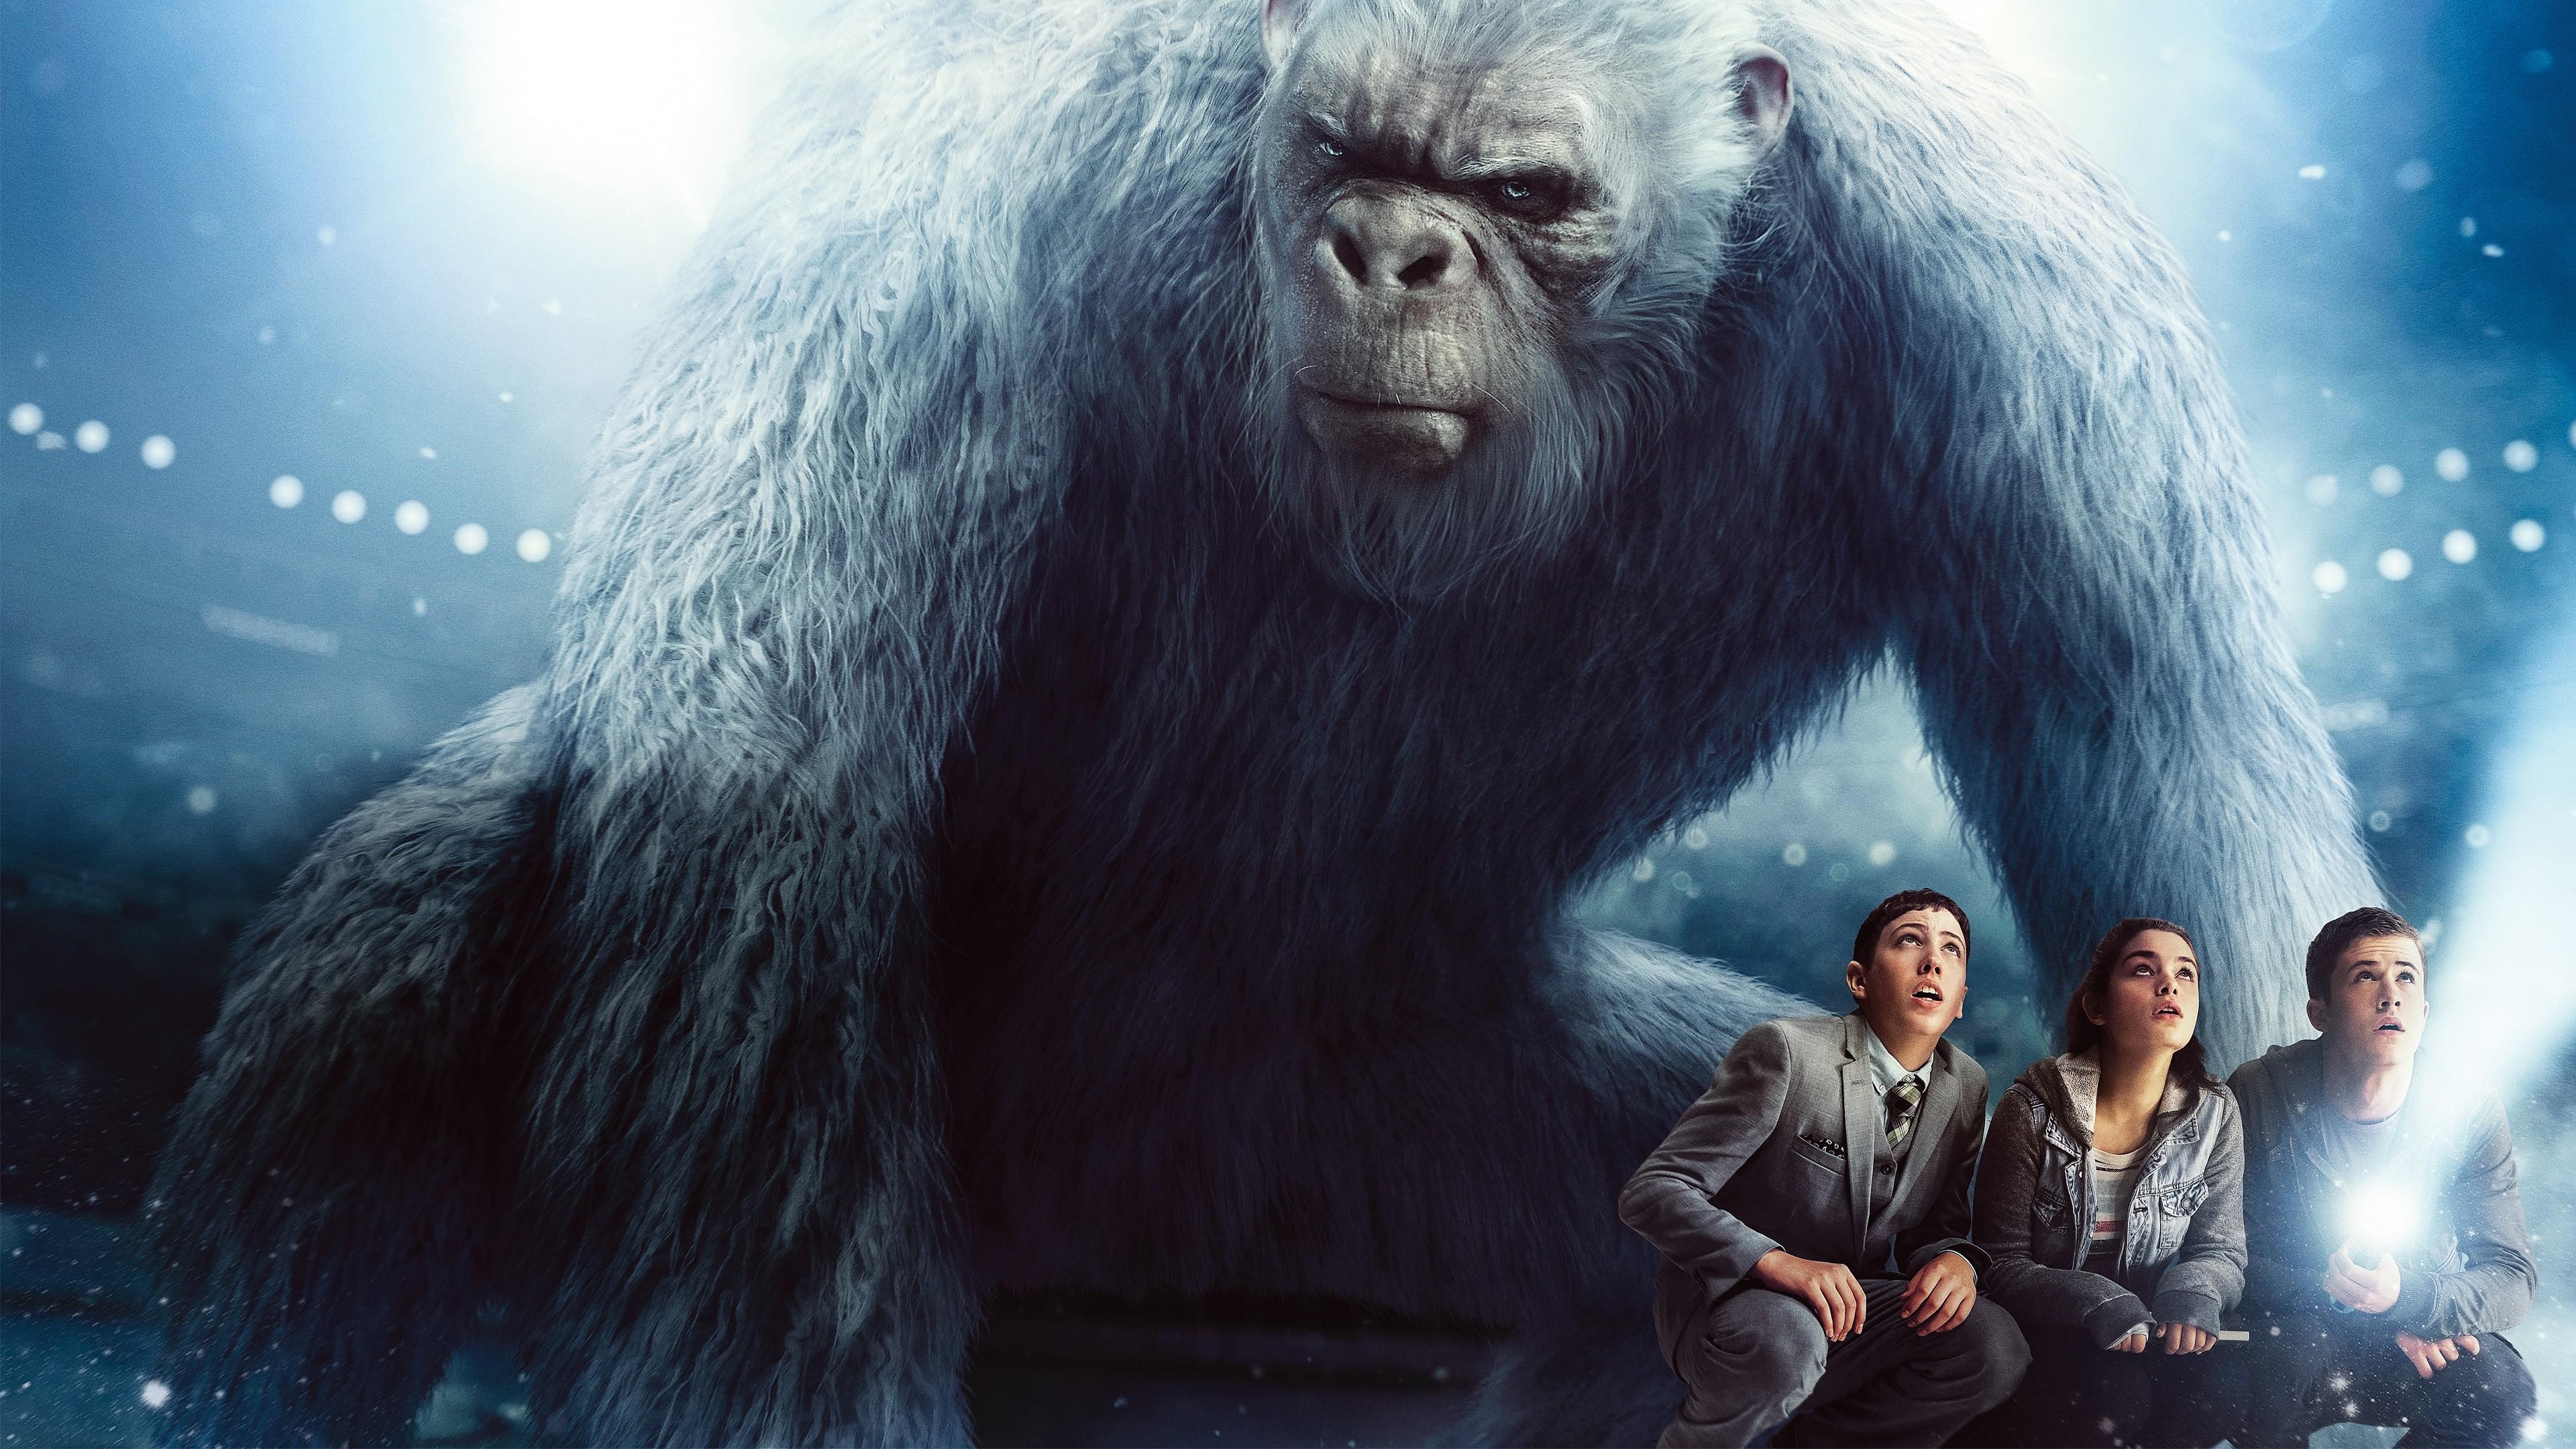 Goosebumps 2015 movie hd movies 4k wallpapers images - Goosebumps wallpaper ...